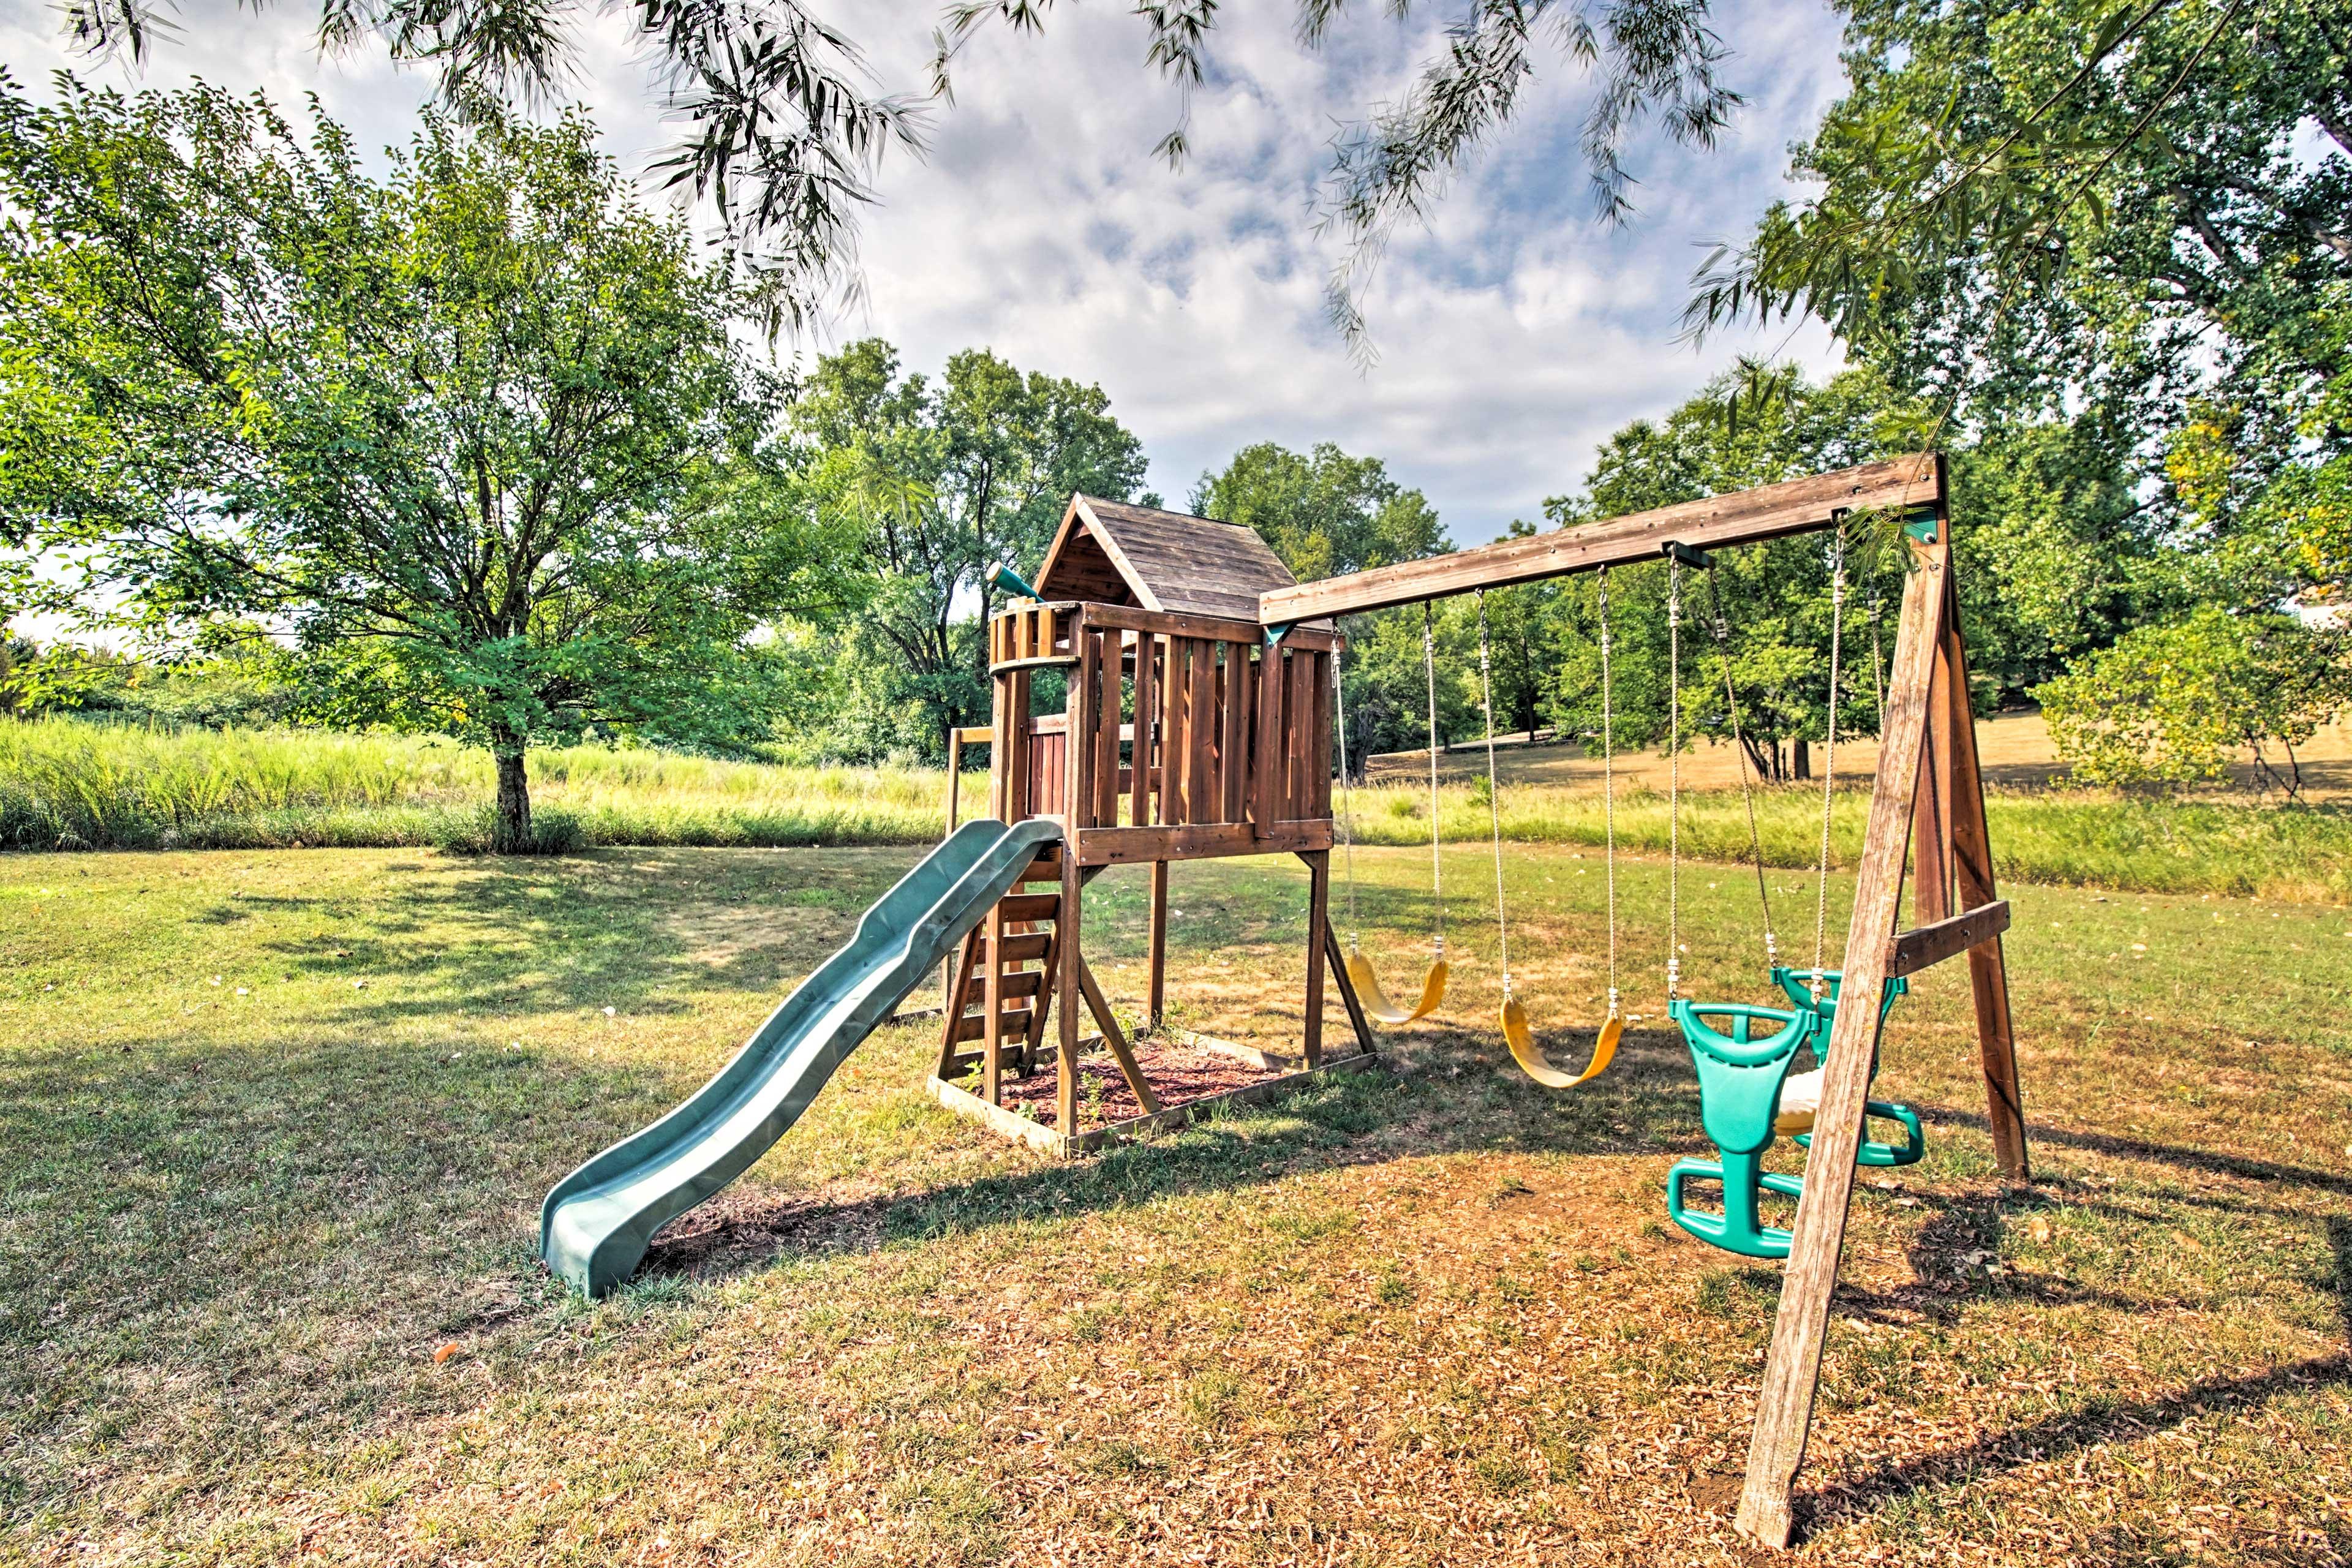 Let the kids romp around on the playground set.